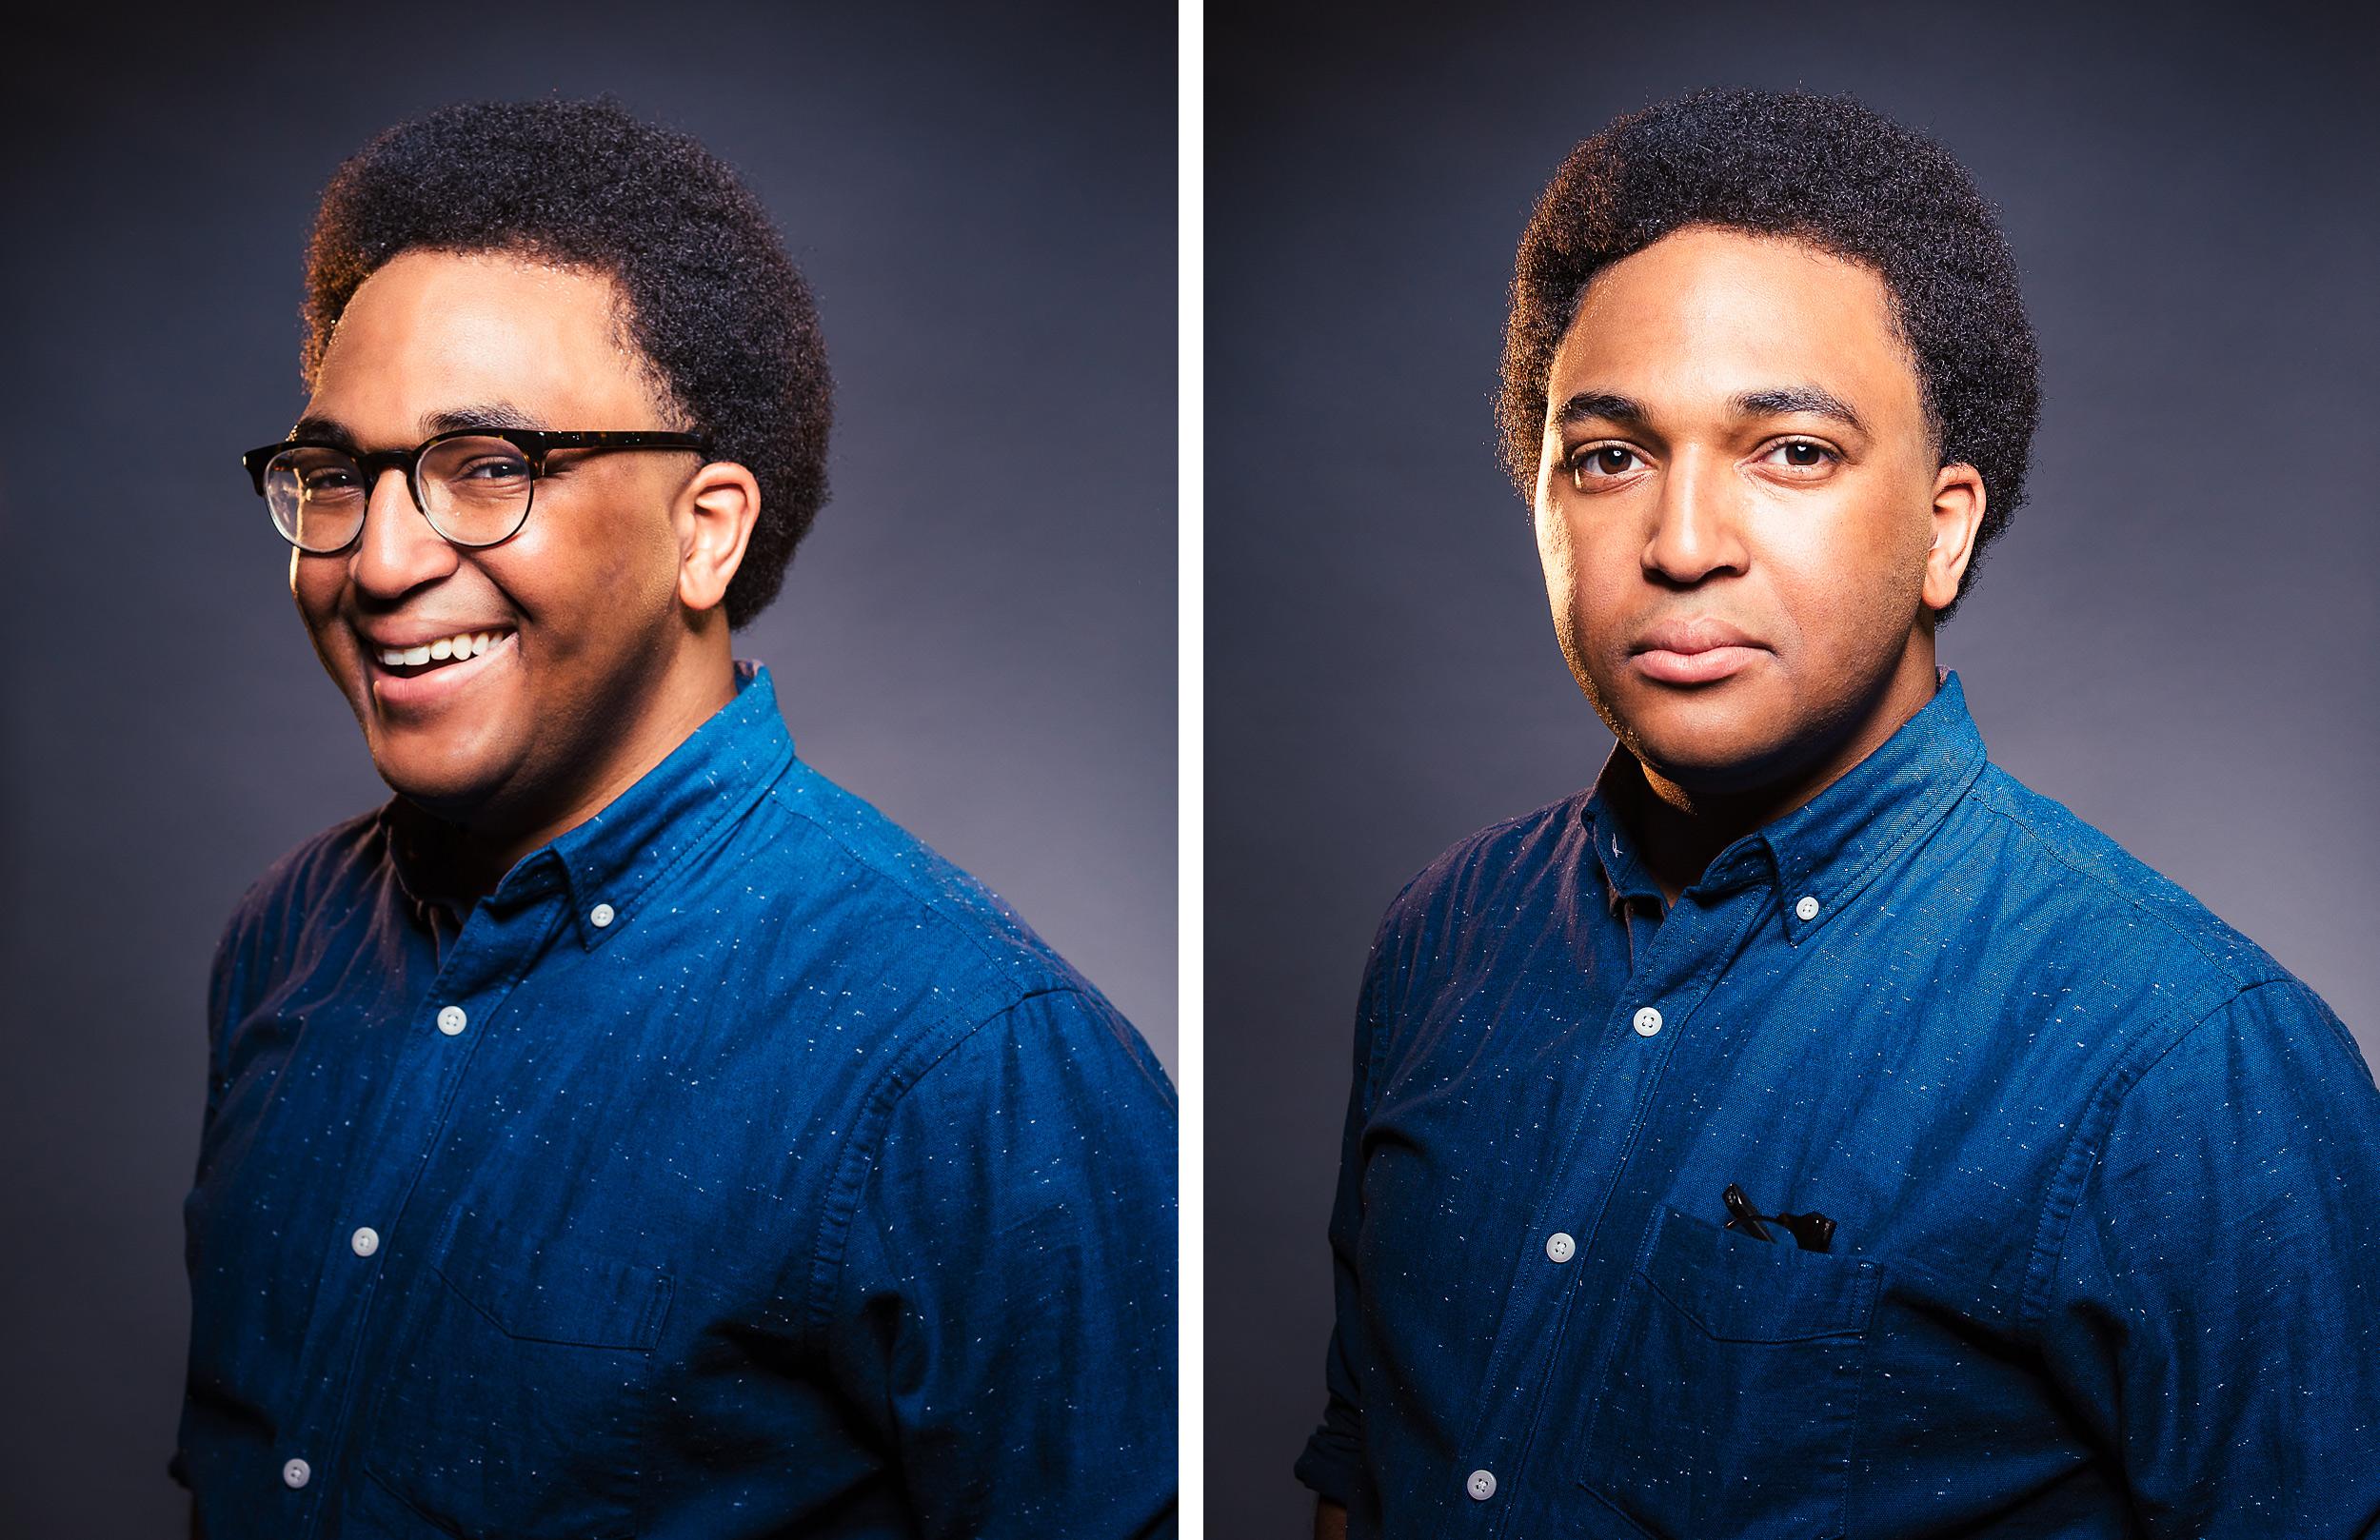 Men Headshots Photography by FullMotion Photos+Cinema - Kenny Chan